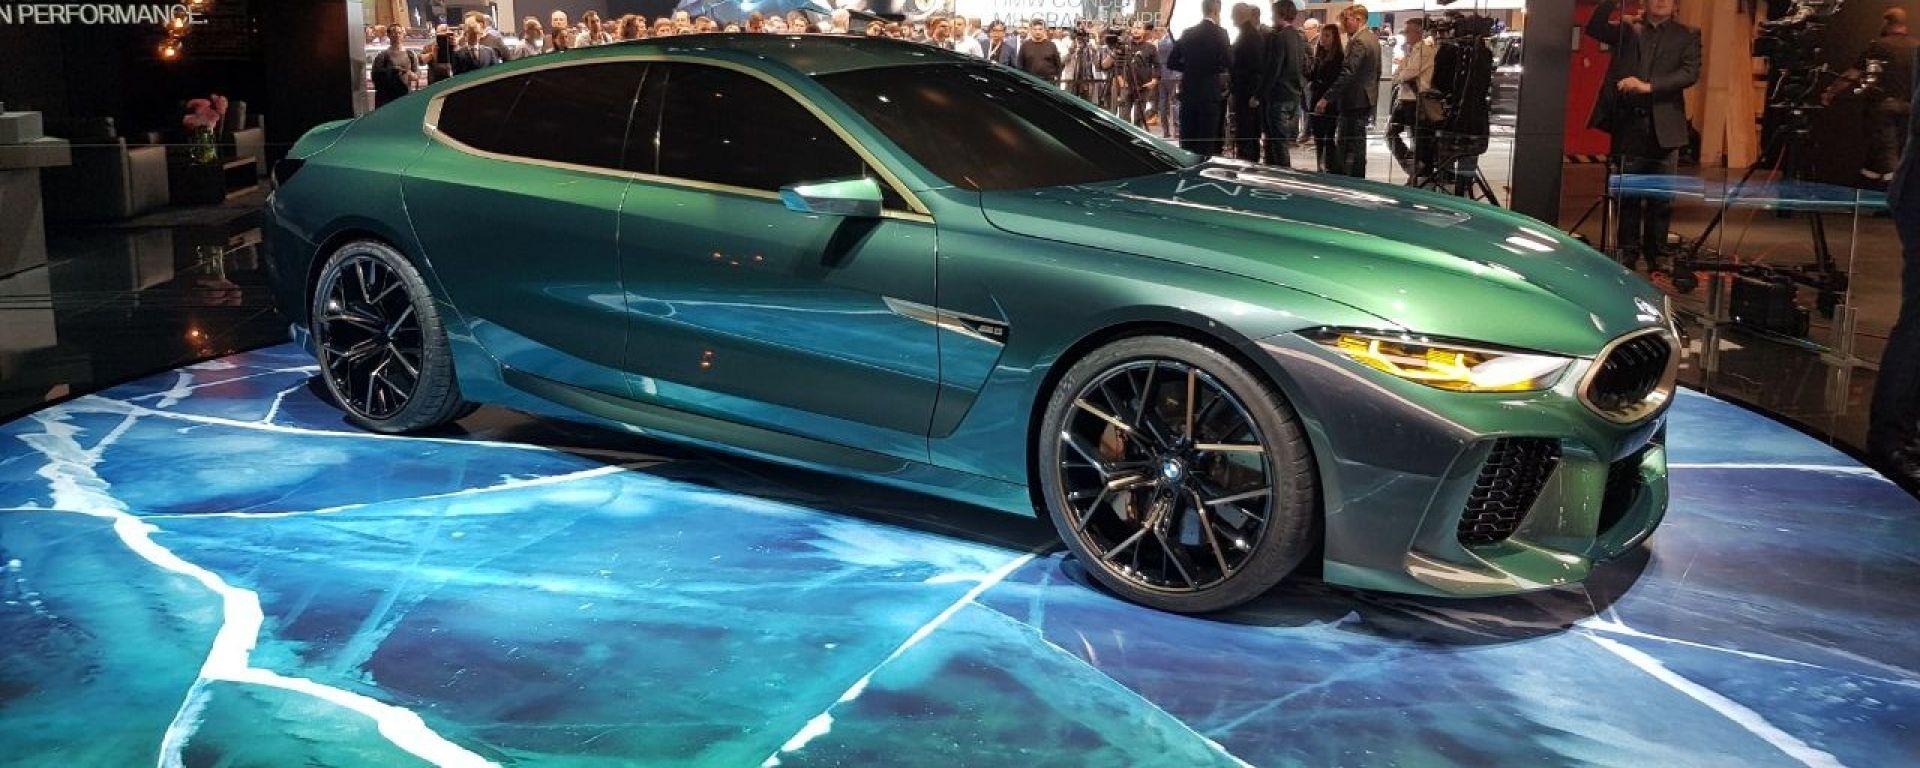 Stand BMW, Salone di Ginevra 2018